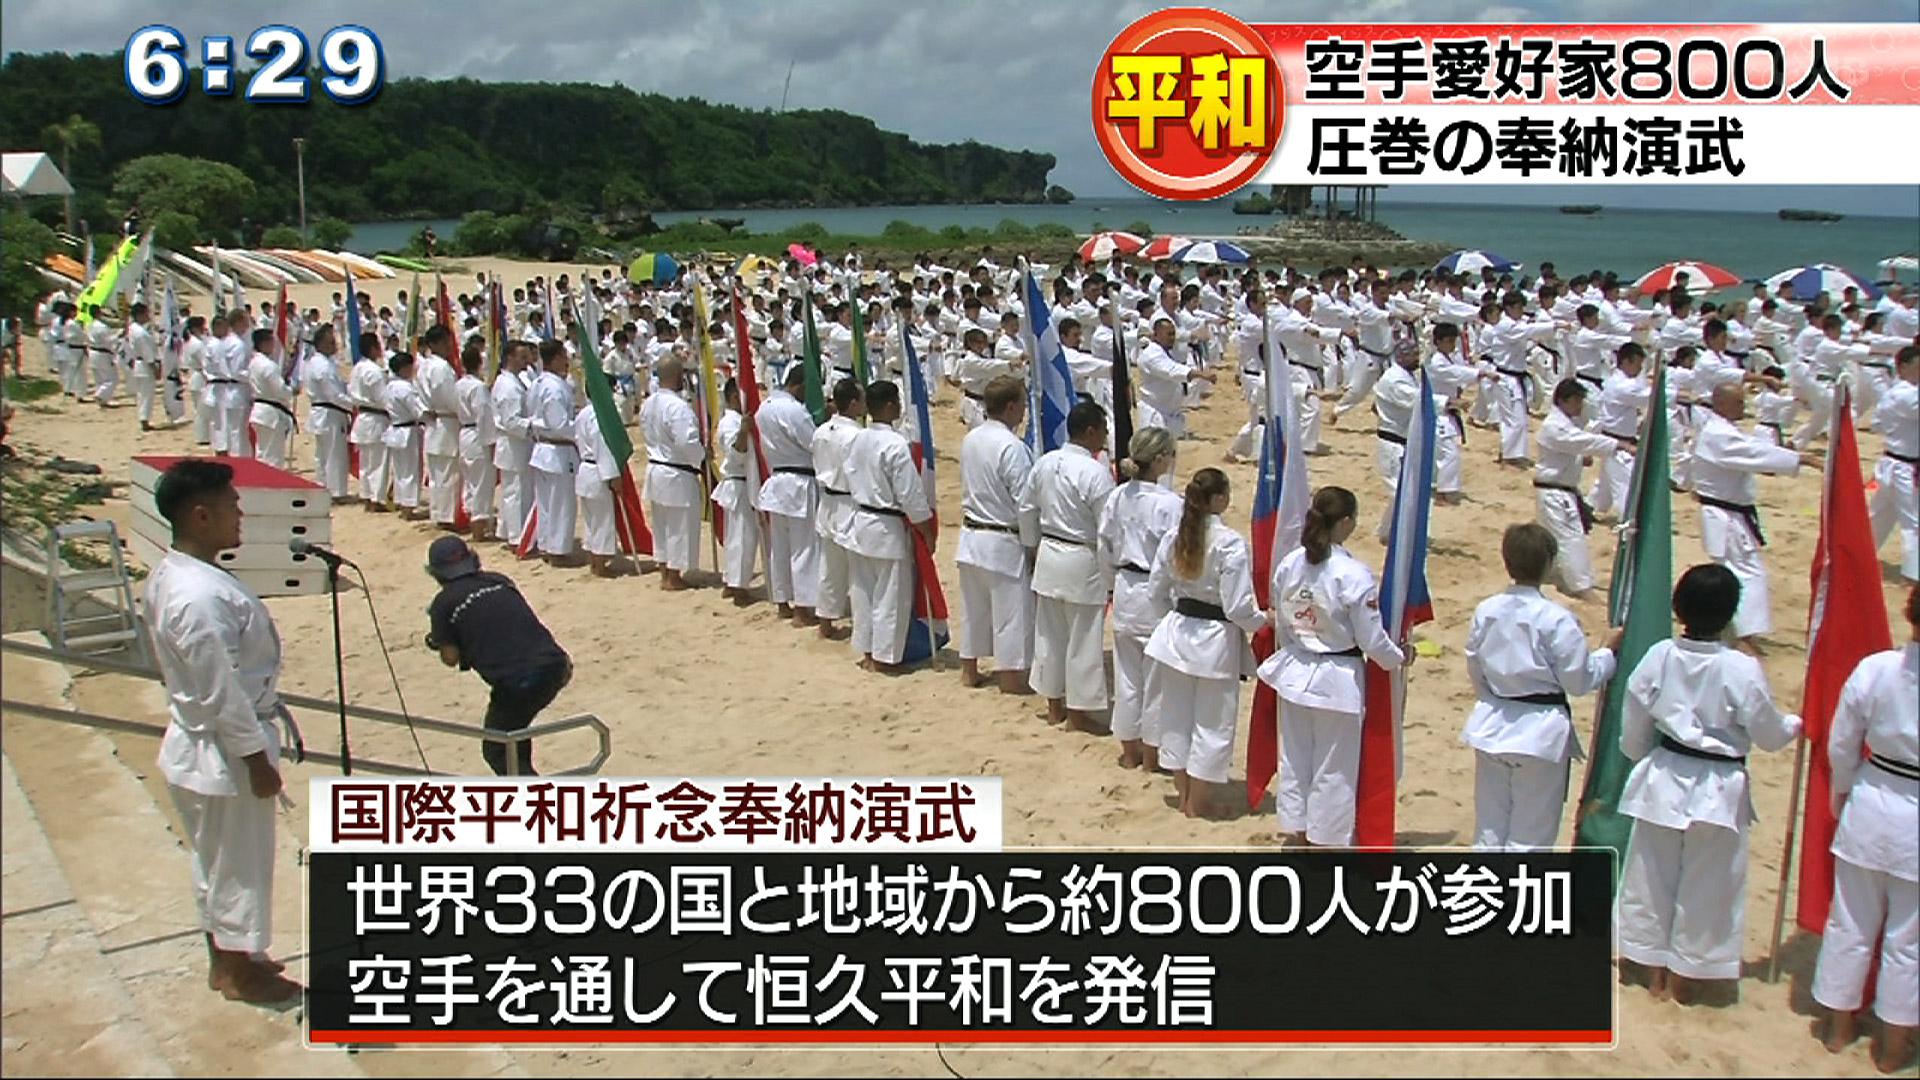 平和祈願 800人が空手演舞